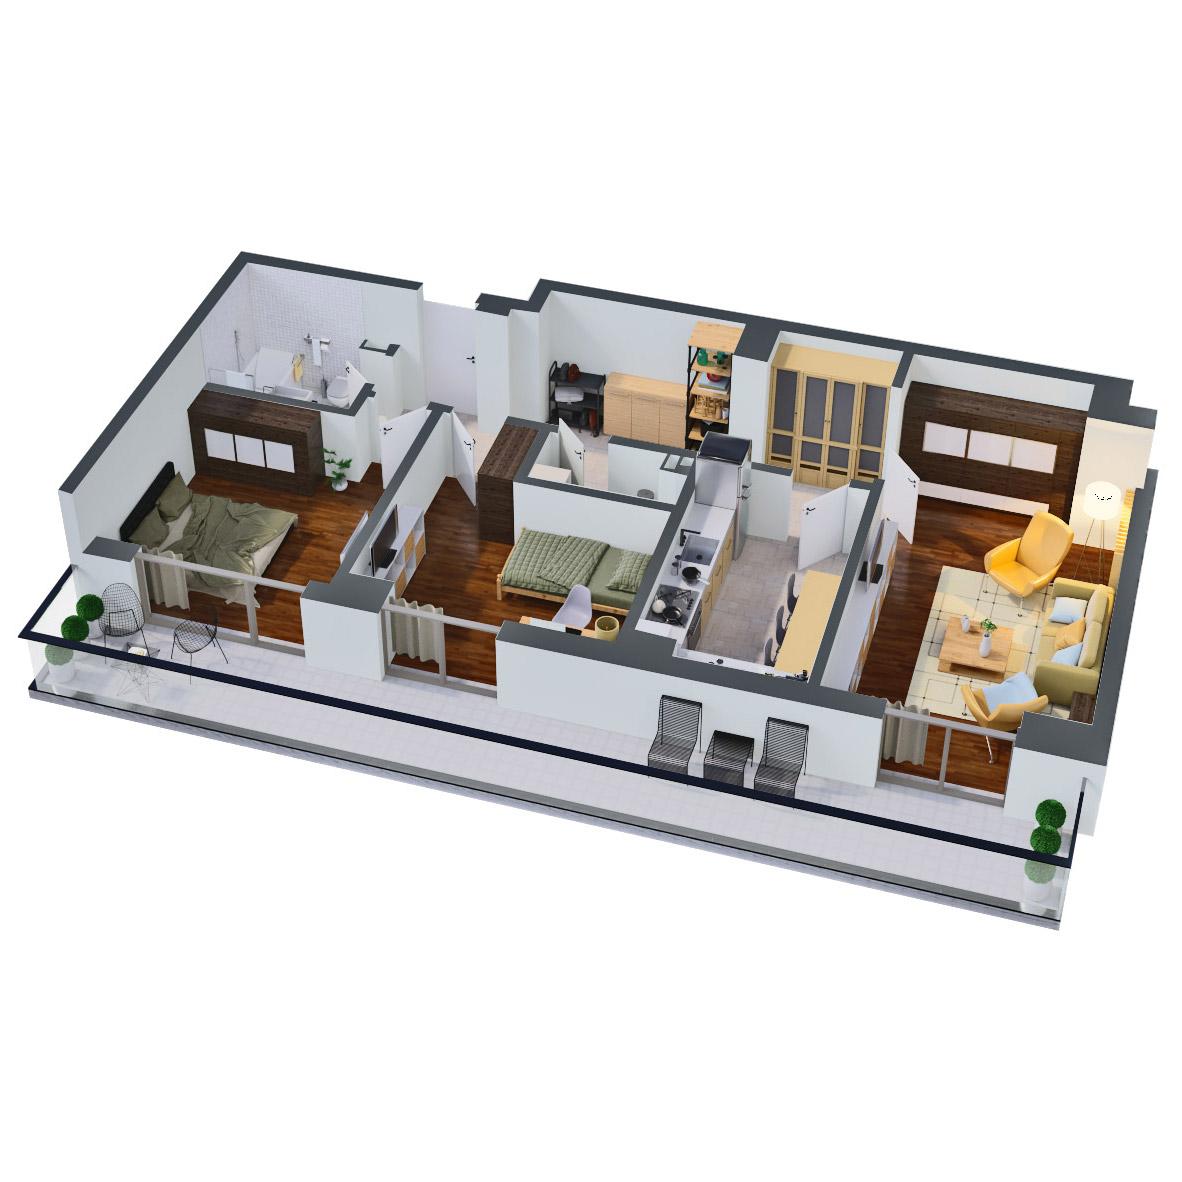 Apartament 3 camere de vanzare Bucuresti - Catedral Residence - Marriott, Piata Unirii, 13 Septembrie, Izvor - Tip 5 - T2A - C